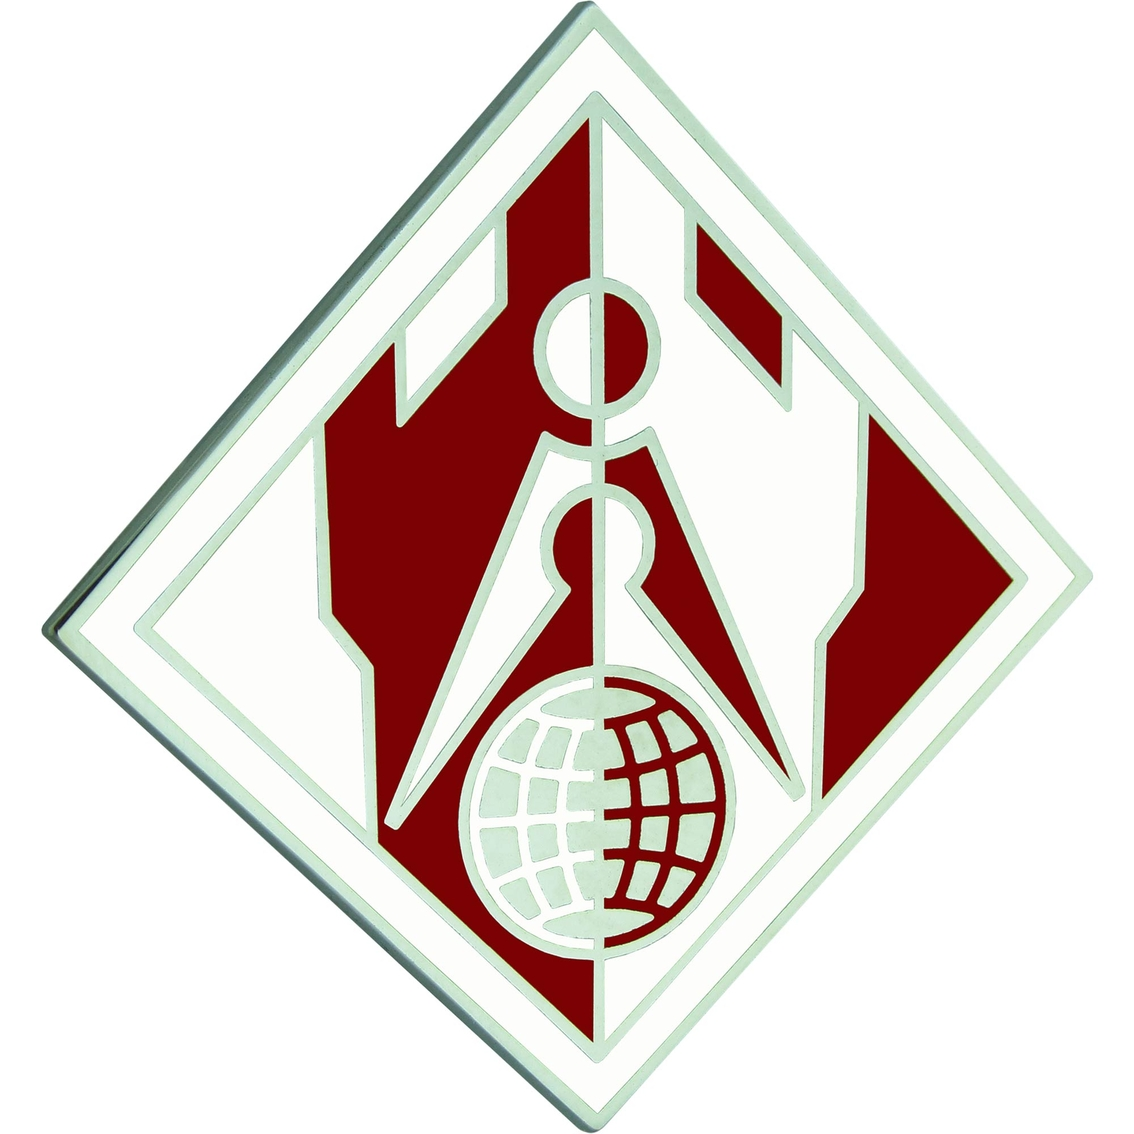 Army Csib Army Corps Of Engineers Alpha Units Military Shop